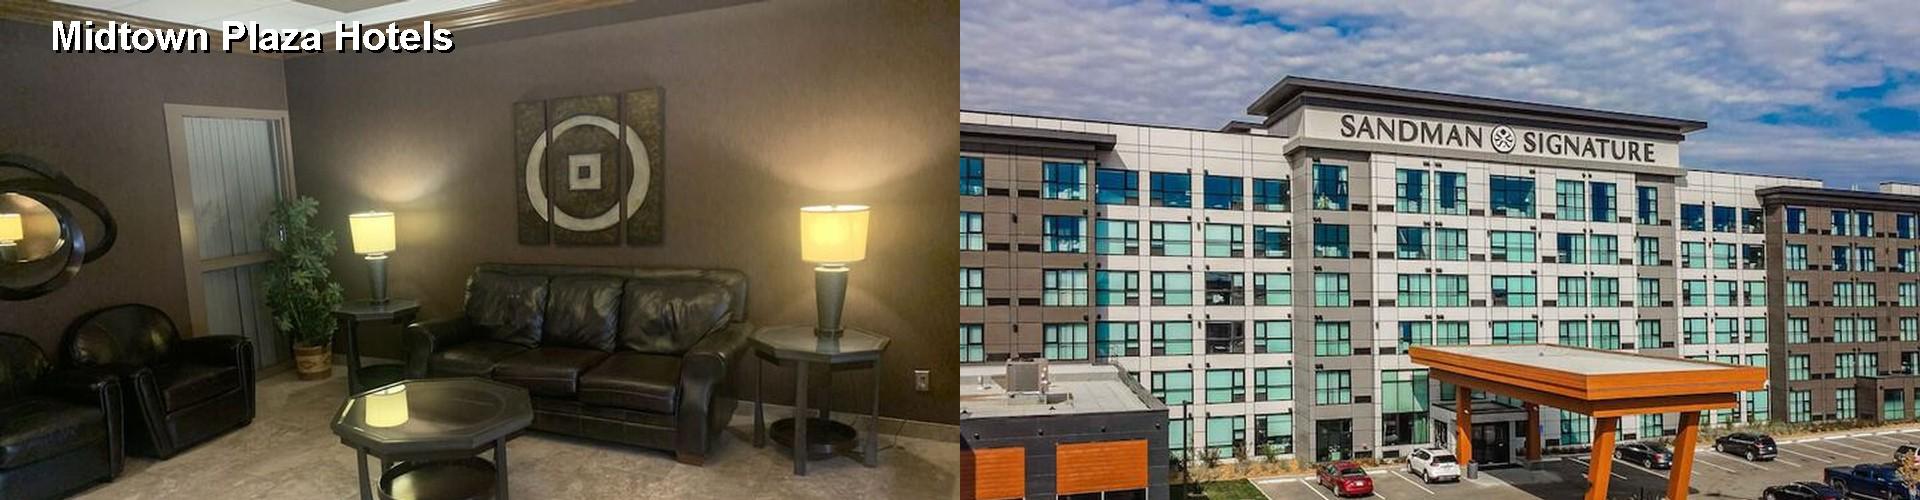 5 Best Hotels Near Midtown Plaza